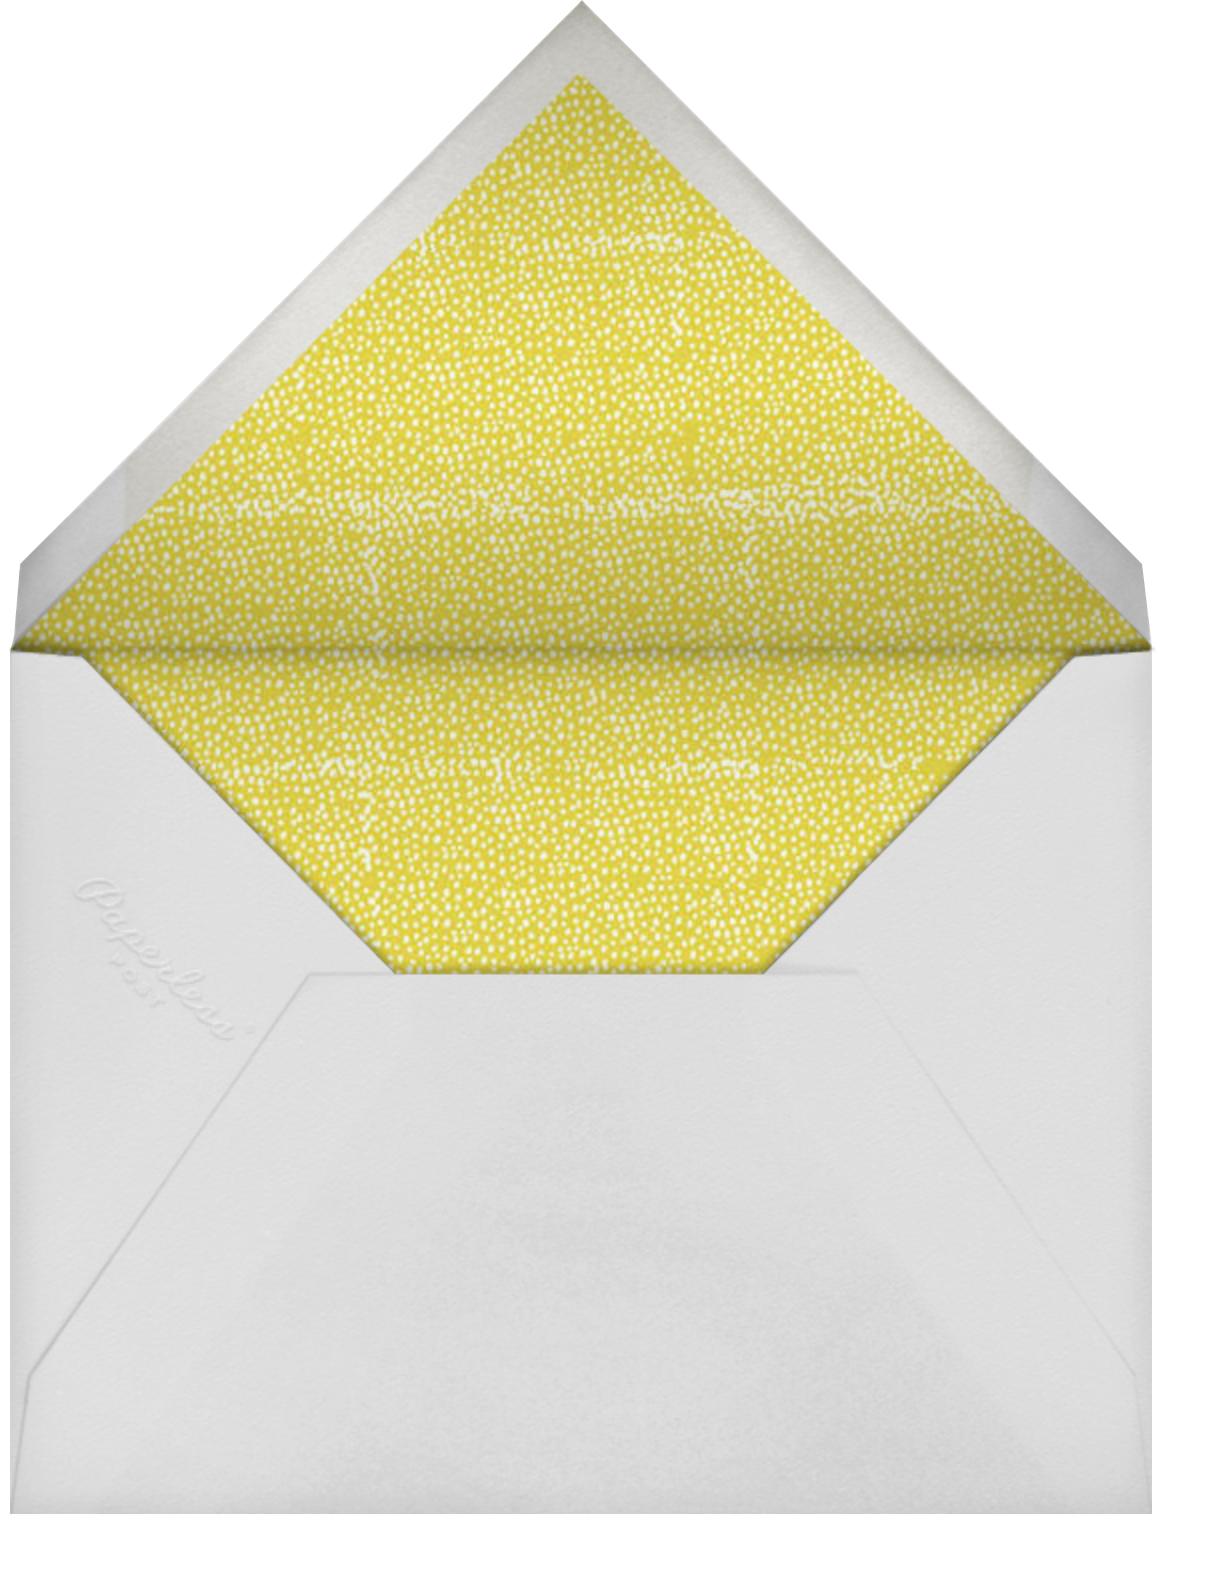 Blooming Baby - Great Scot - Mr. Boddington's Studio - Baby shower - envelope back